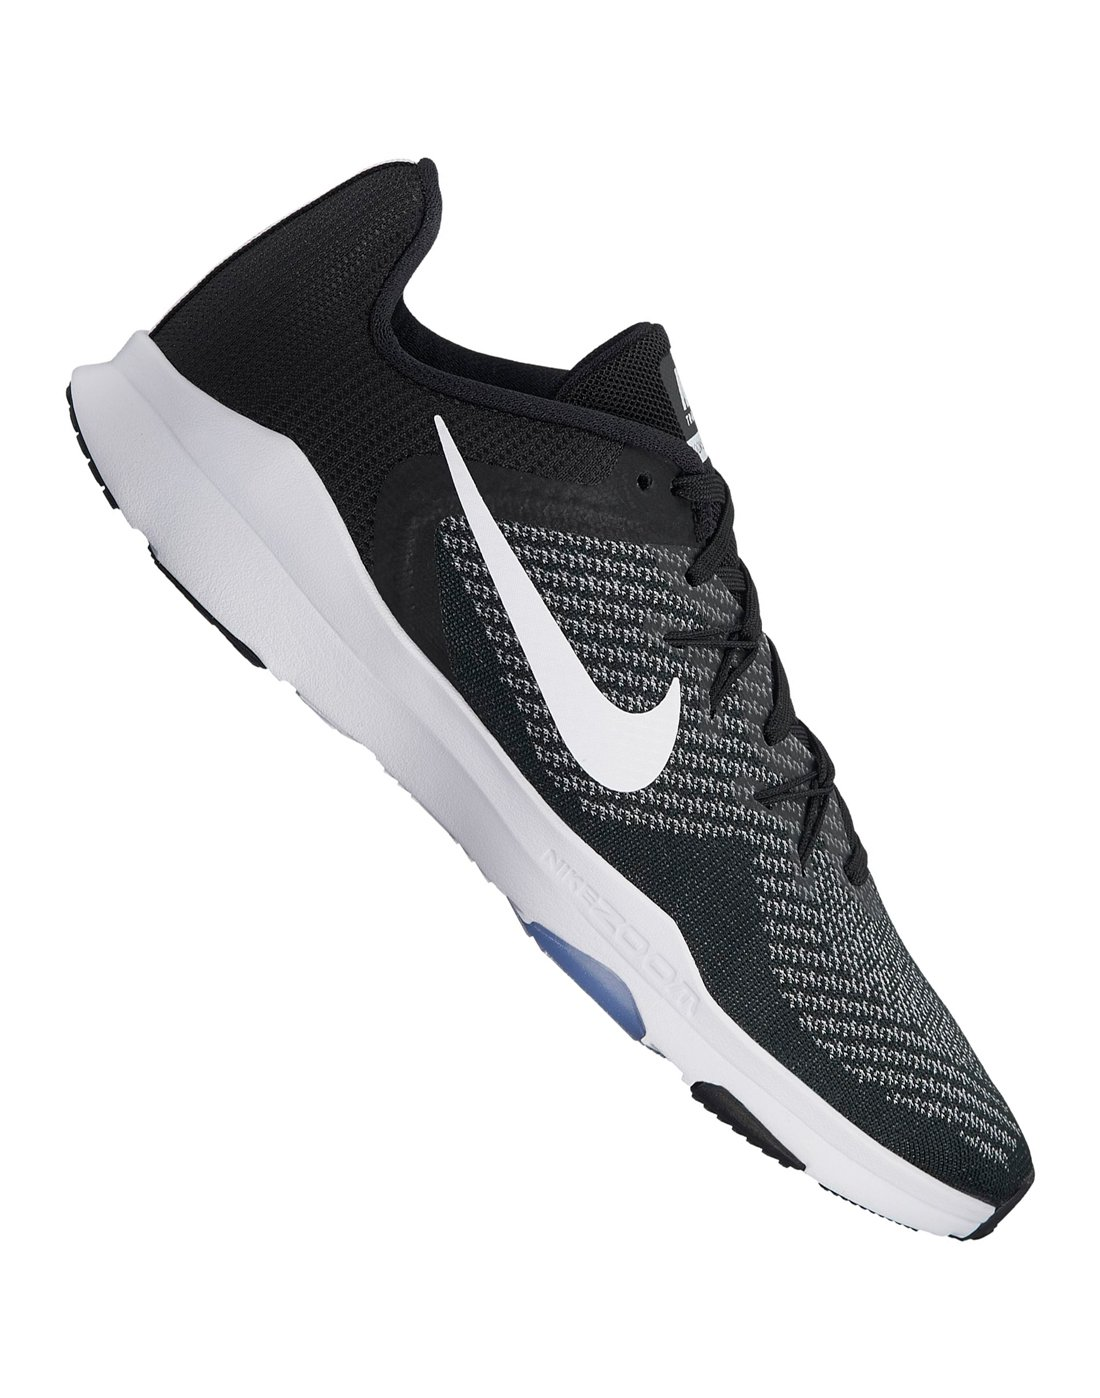 Women's Nike Zoom Condition 2 | Black